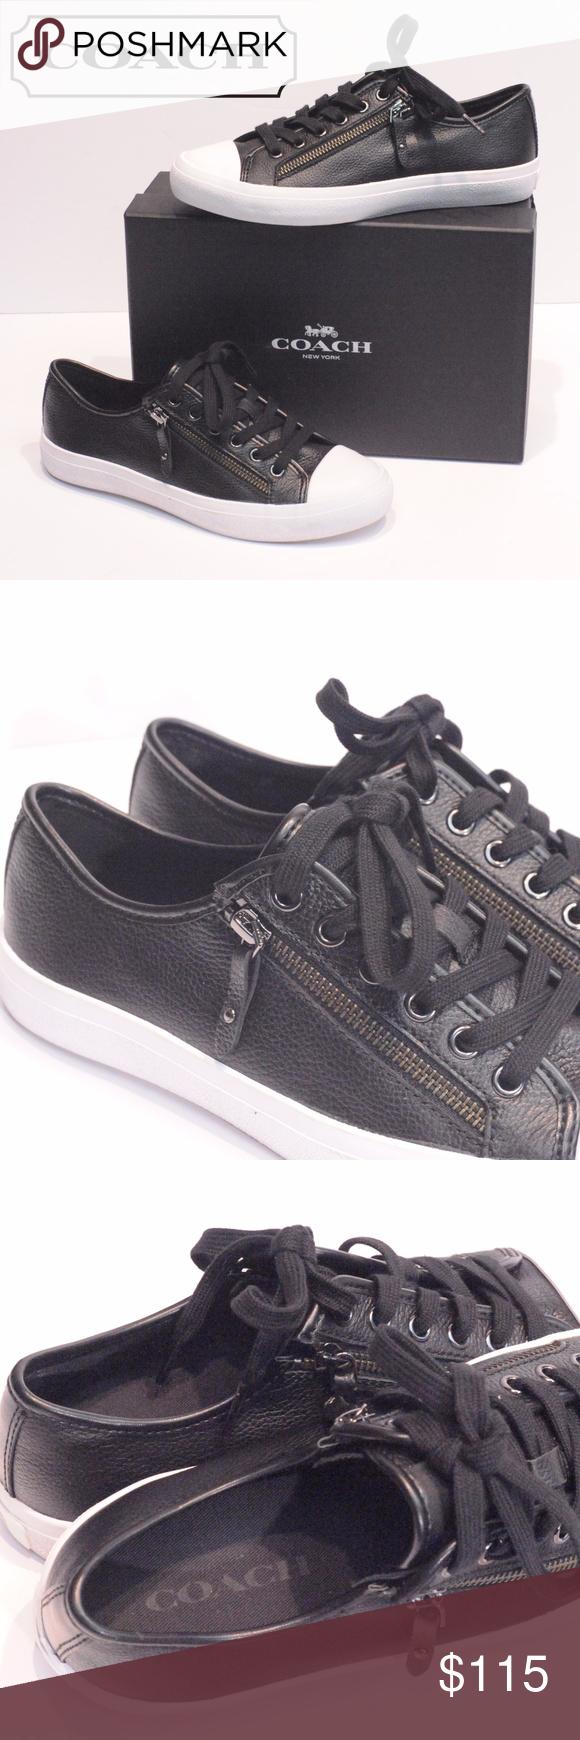 coach shoes converse style